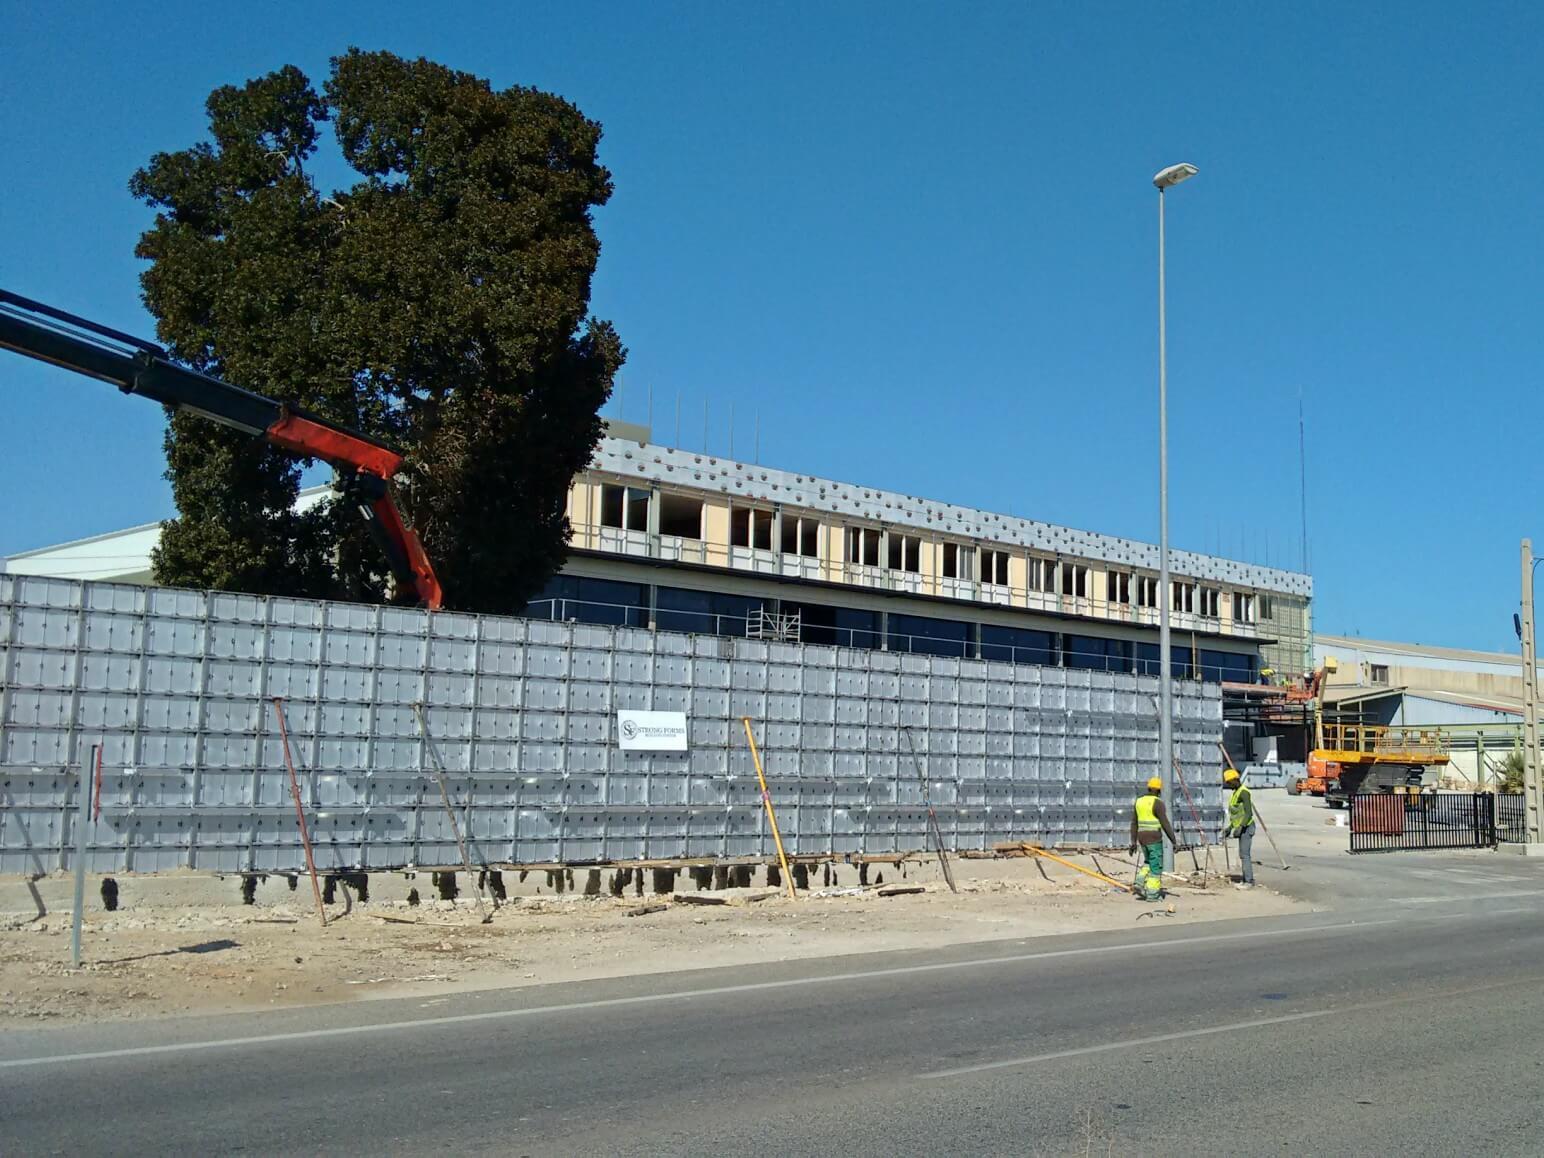 proyecto muro perimetral encofrados de aluminio construccion strong forms alicante 12